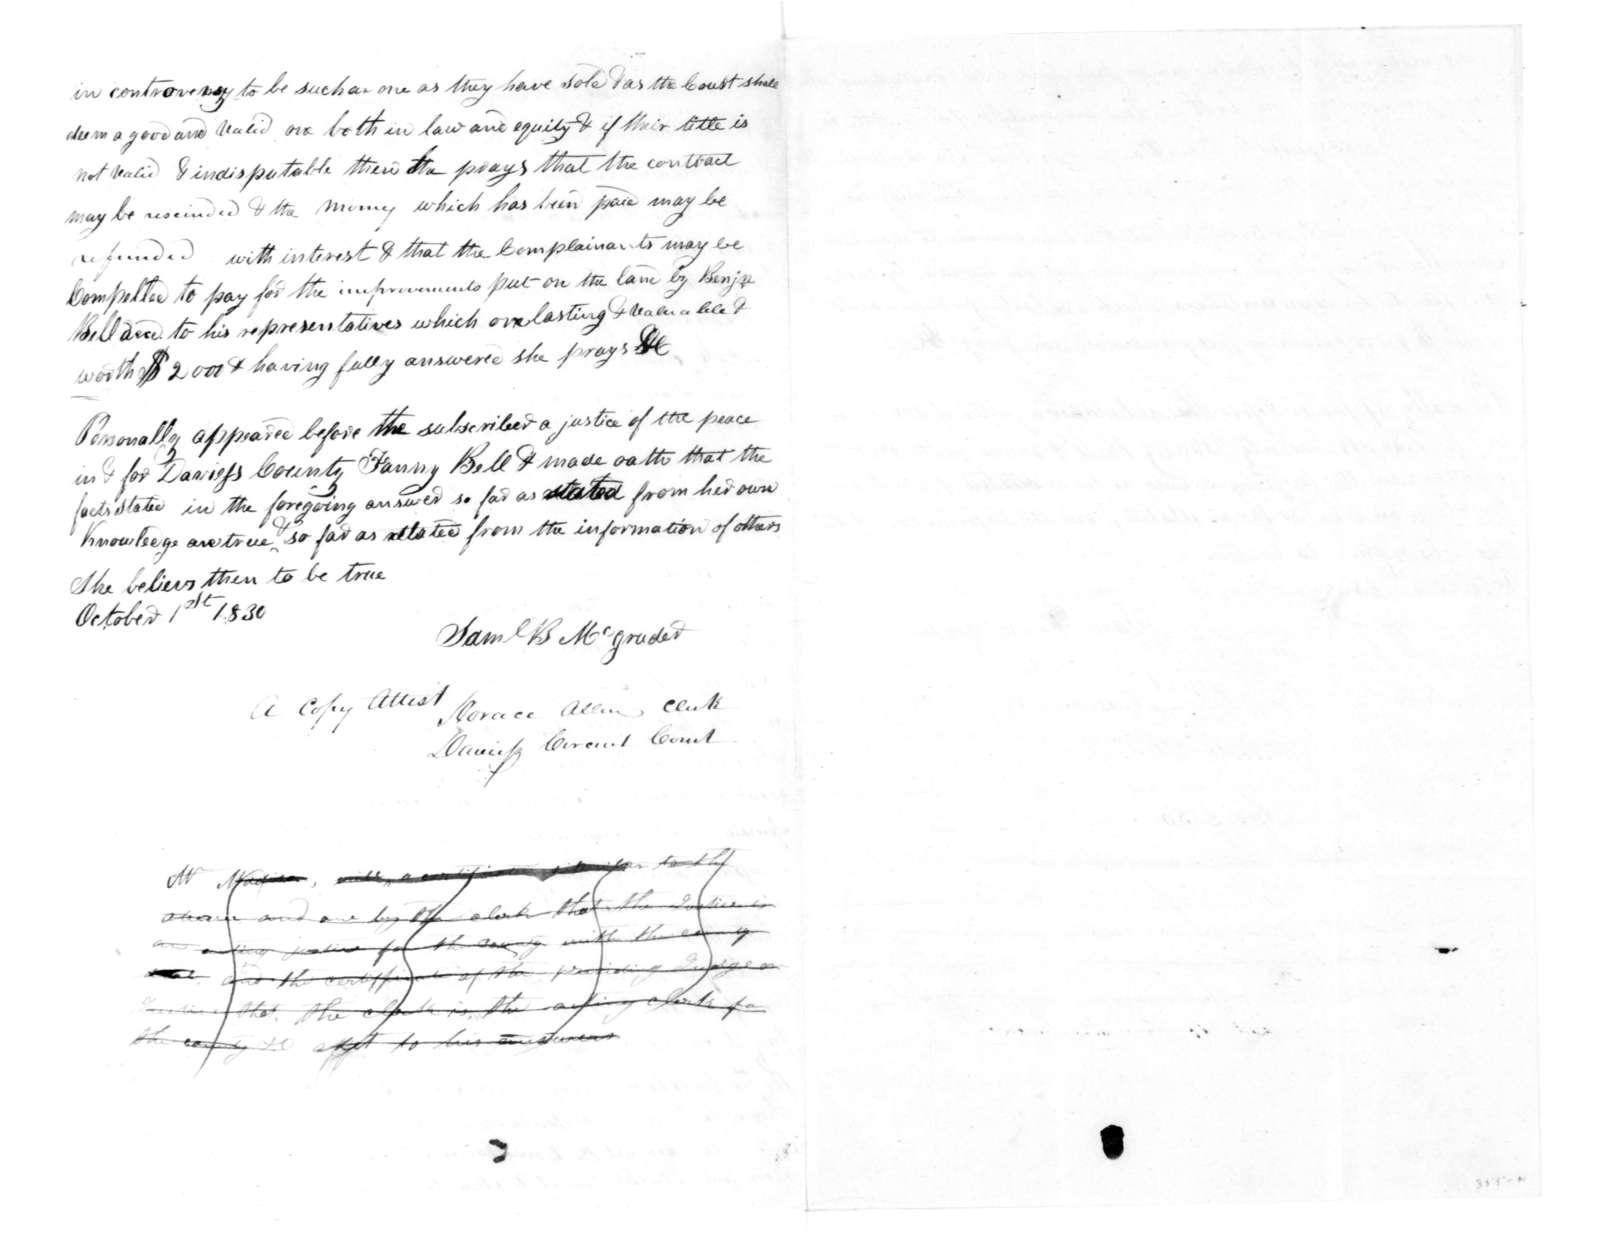 Samuel B. McGruder, October 1, 1830. Two sworn statements regarding Chancery Court Suits.